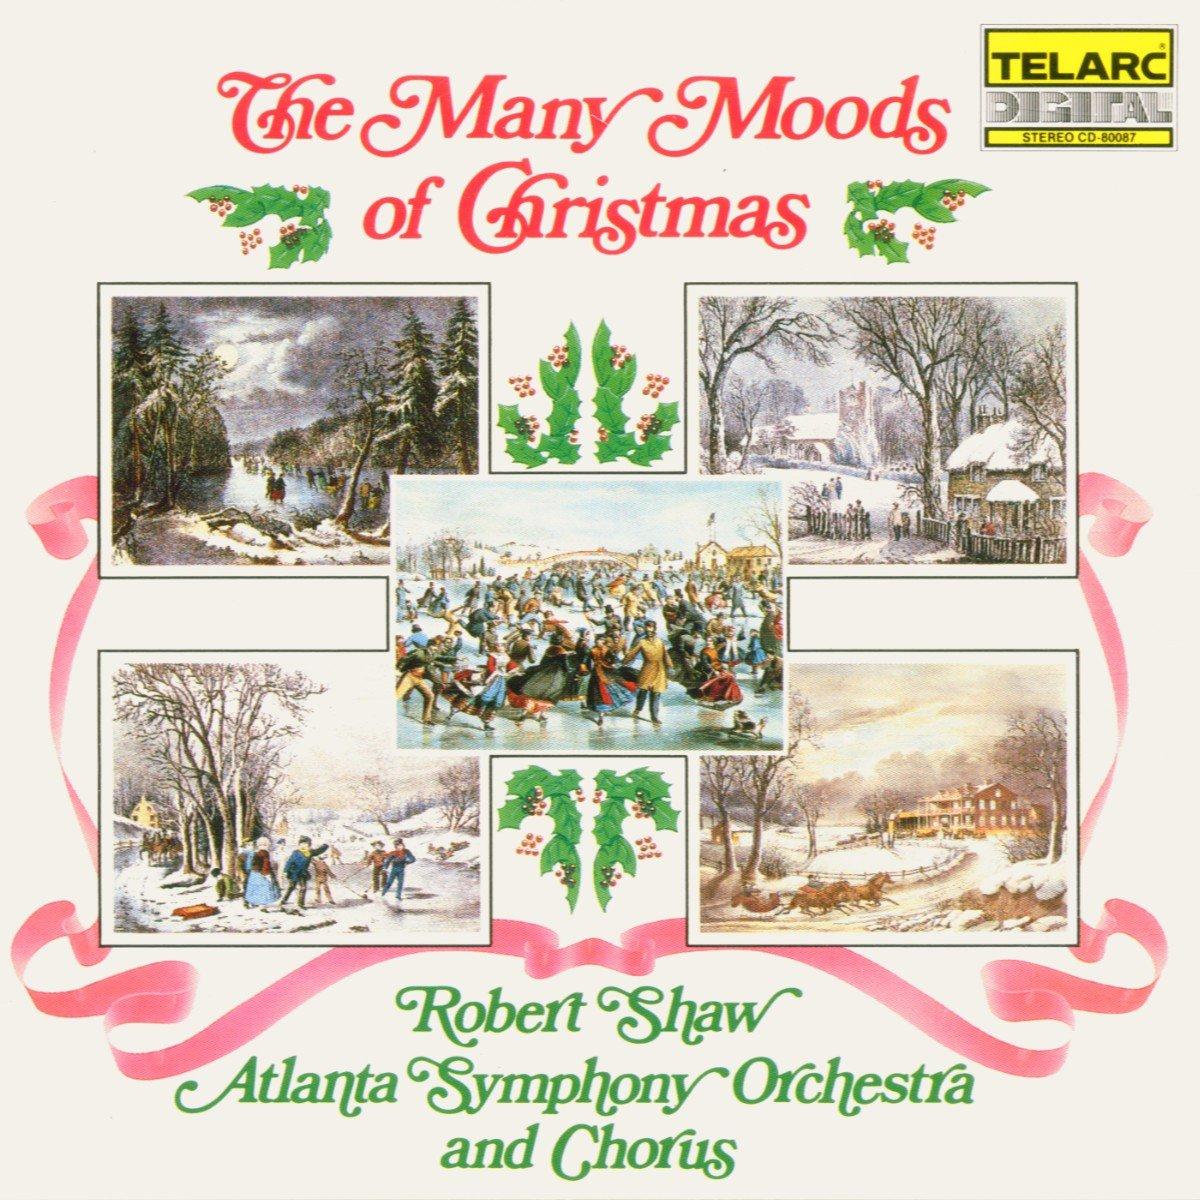 Atlanta Symphony Orchestra \u0026 Chorus, Robert Shaw, Robert Russell ...